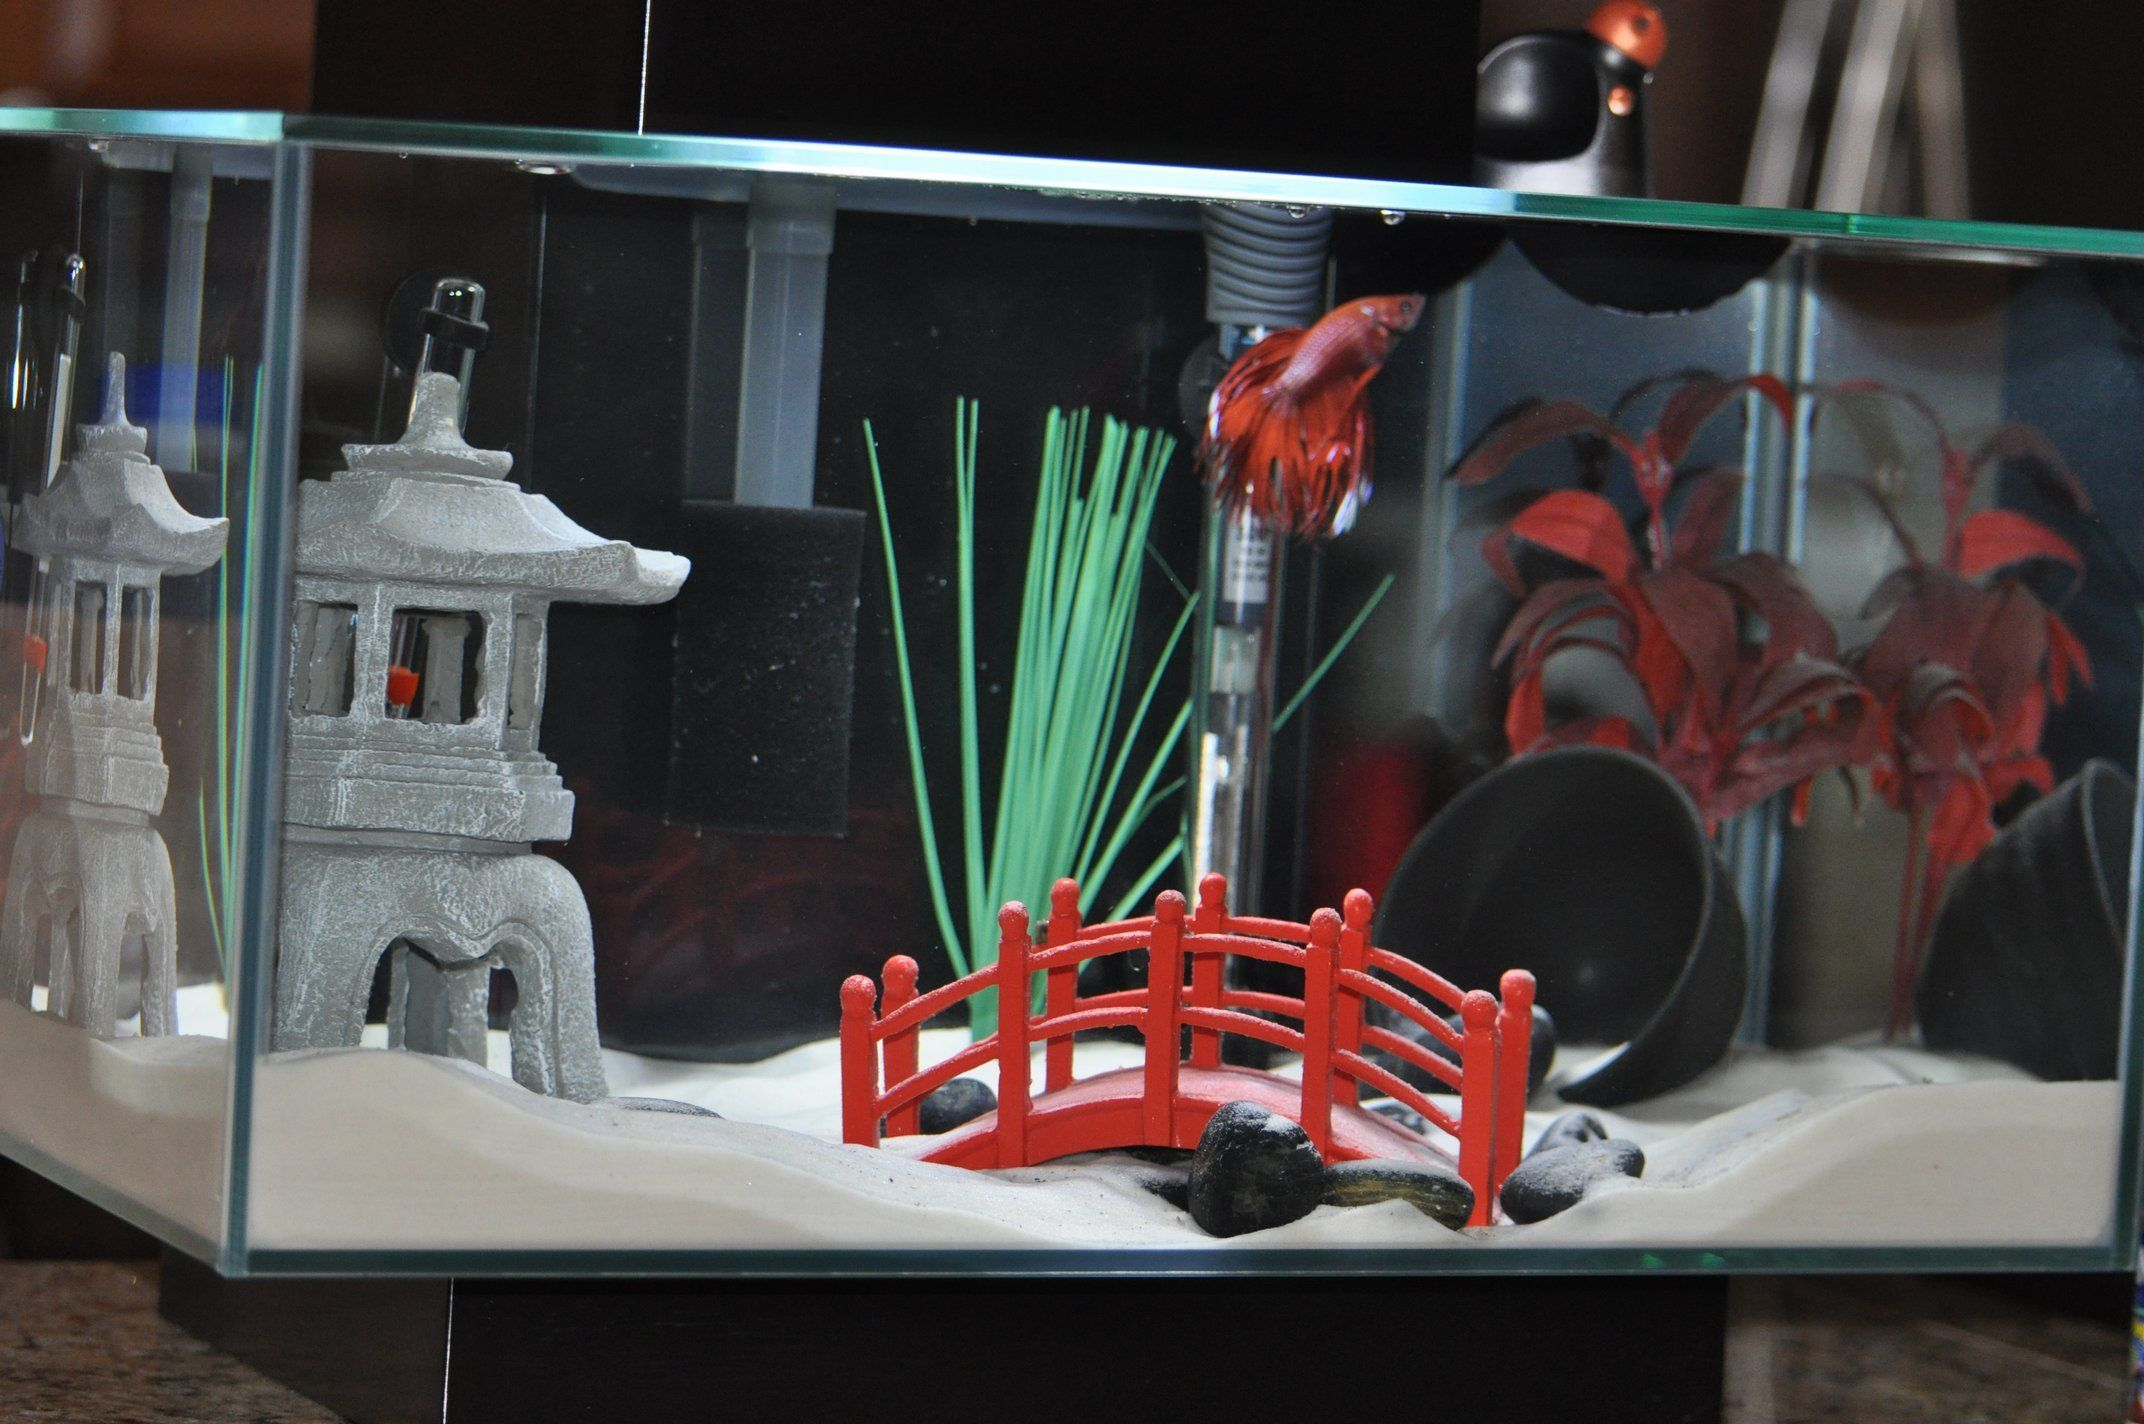 #goldfish #gallon #themed #asian #tank #tank #my10 Gallon Tank: My Asian Themed Goldfish Tank - 1321...